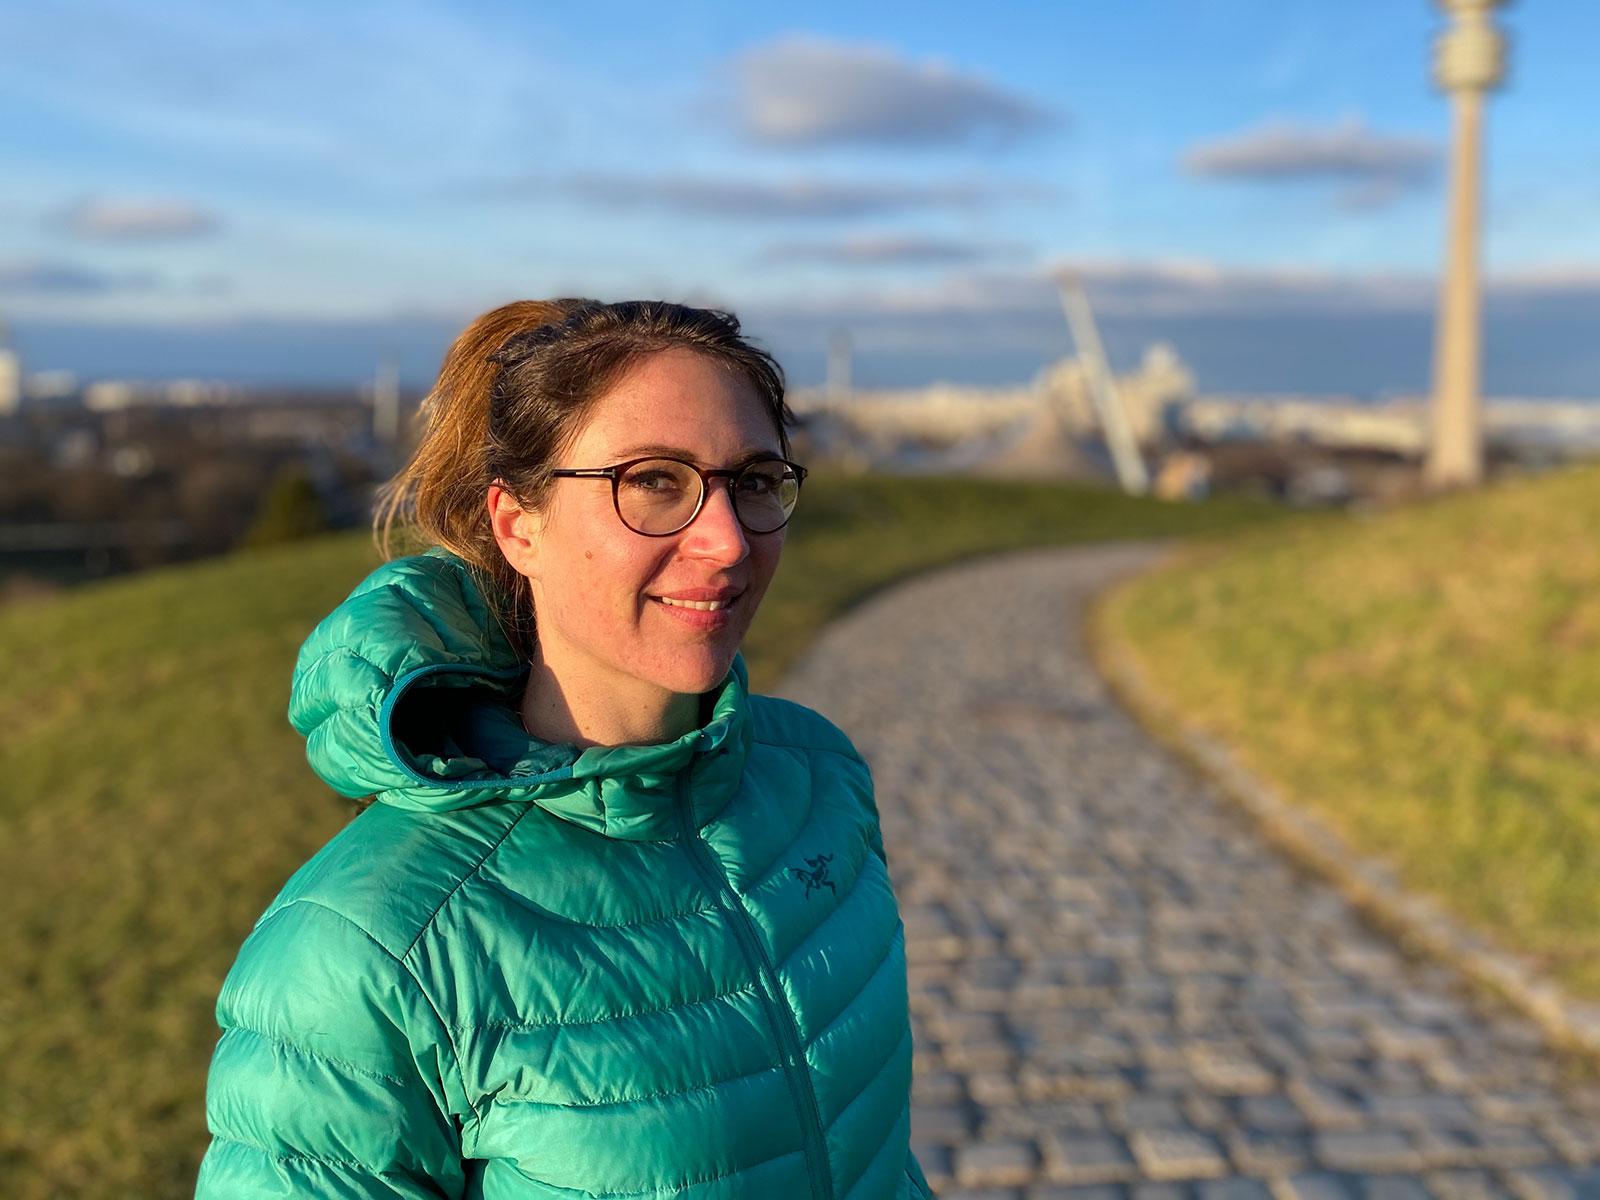 Joana_Schmidtjansen_Rumpeldipumpel_Olympiapark